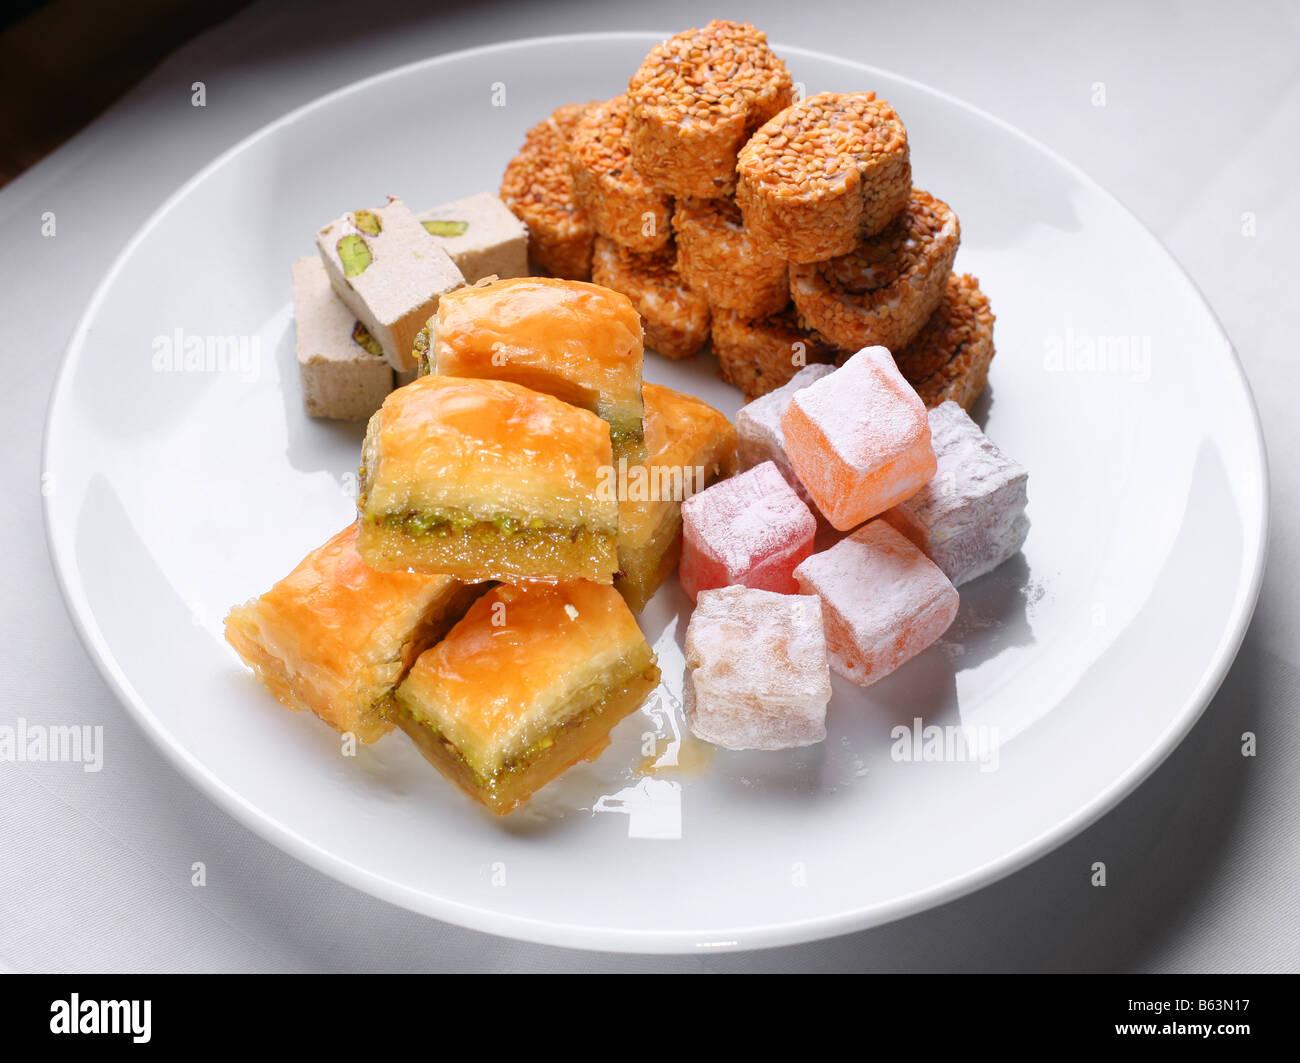 Turkish sweetnesses - Stock Image